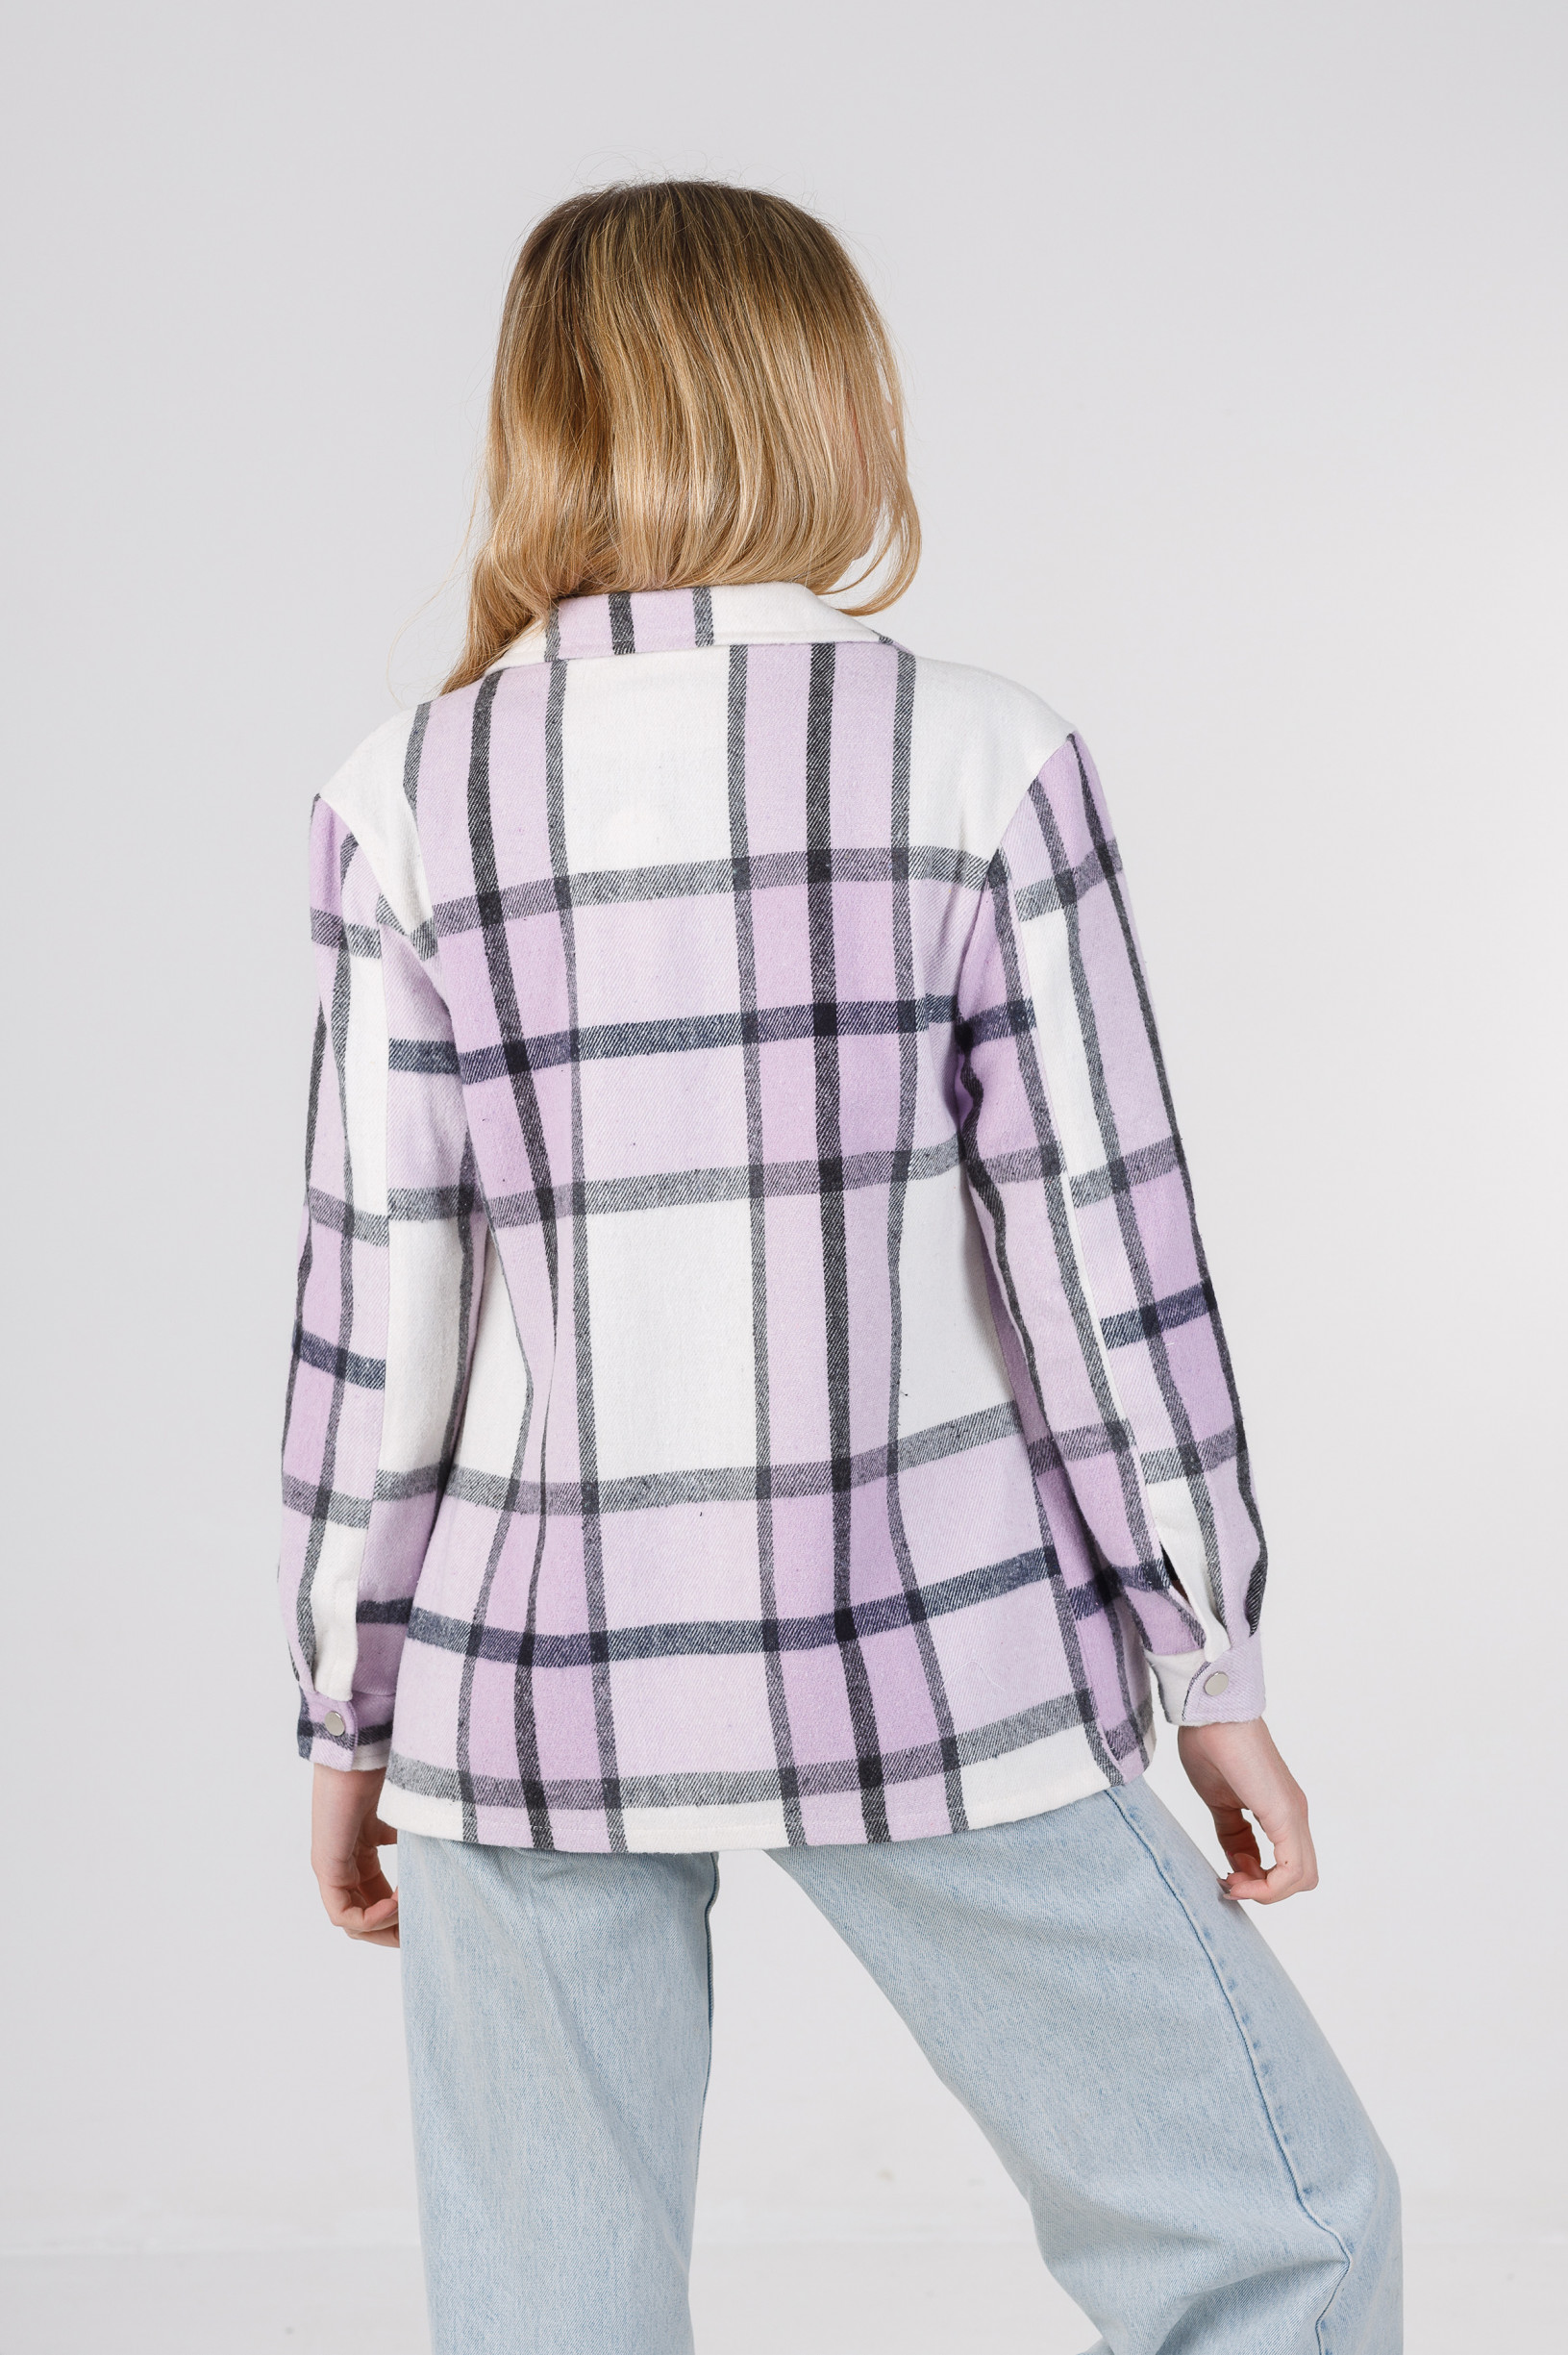 Весенняя рубашка-кардиган фиолет